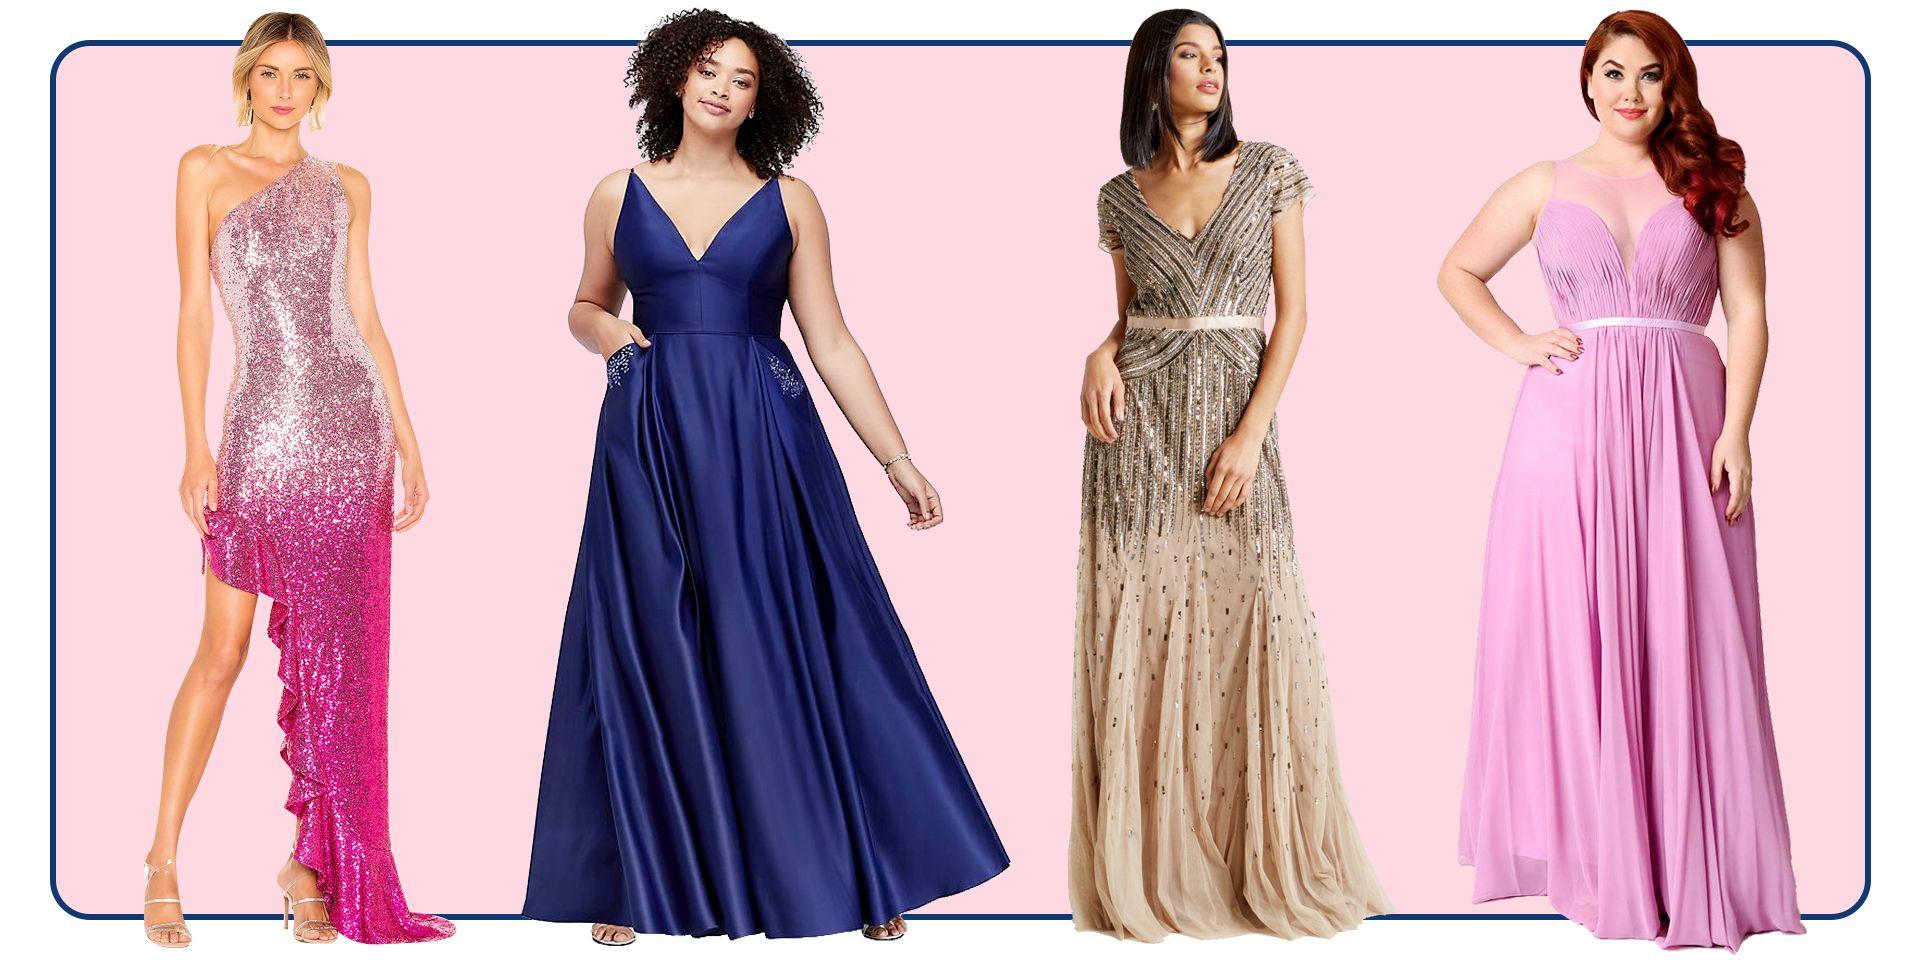 Prom Dresses 2019 , Best Formal Dresses \u0026 Style for Prom